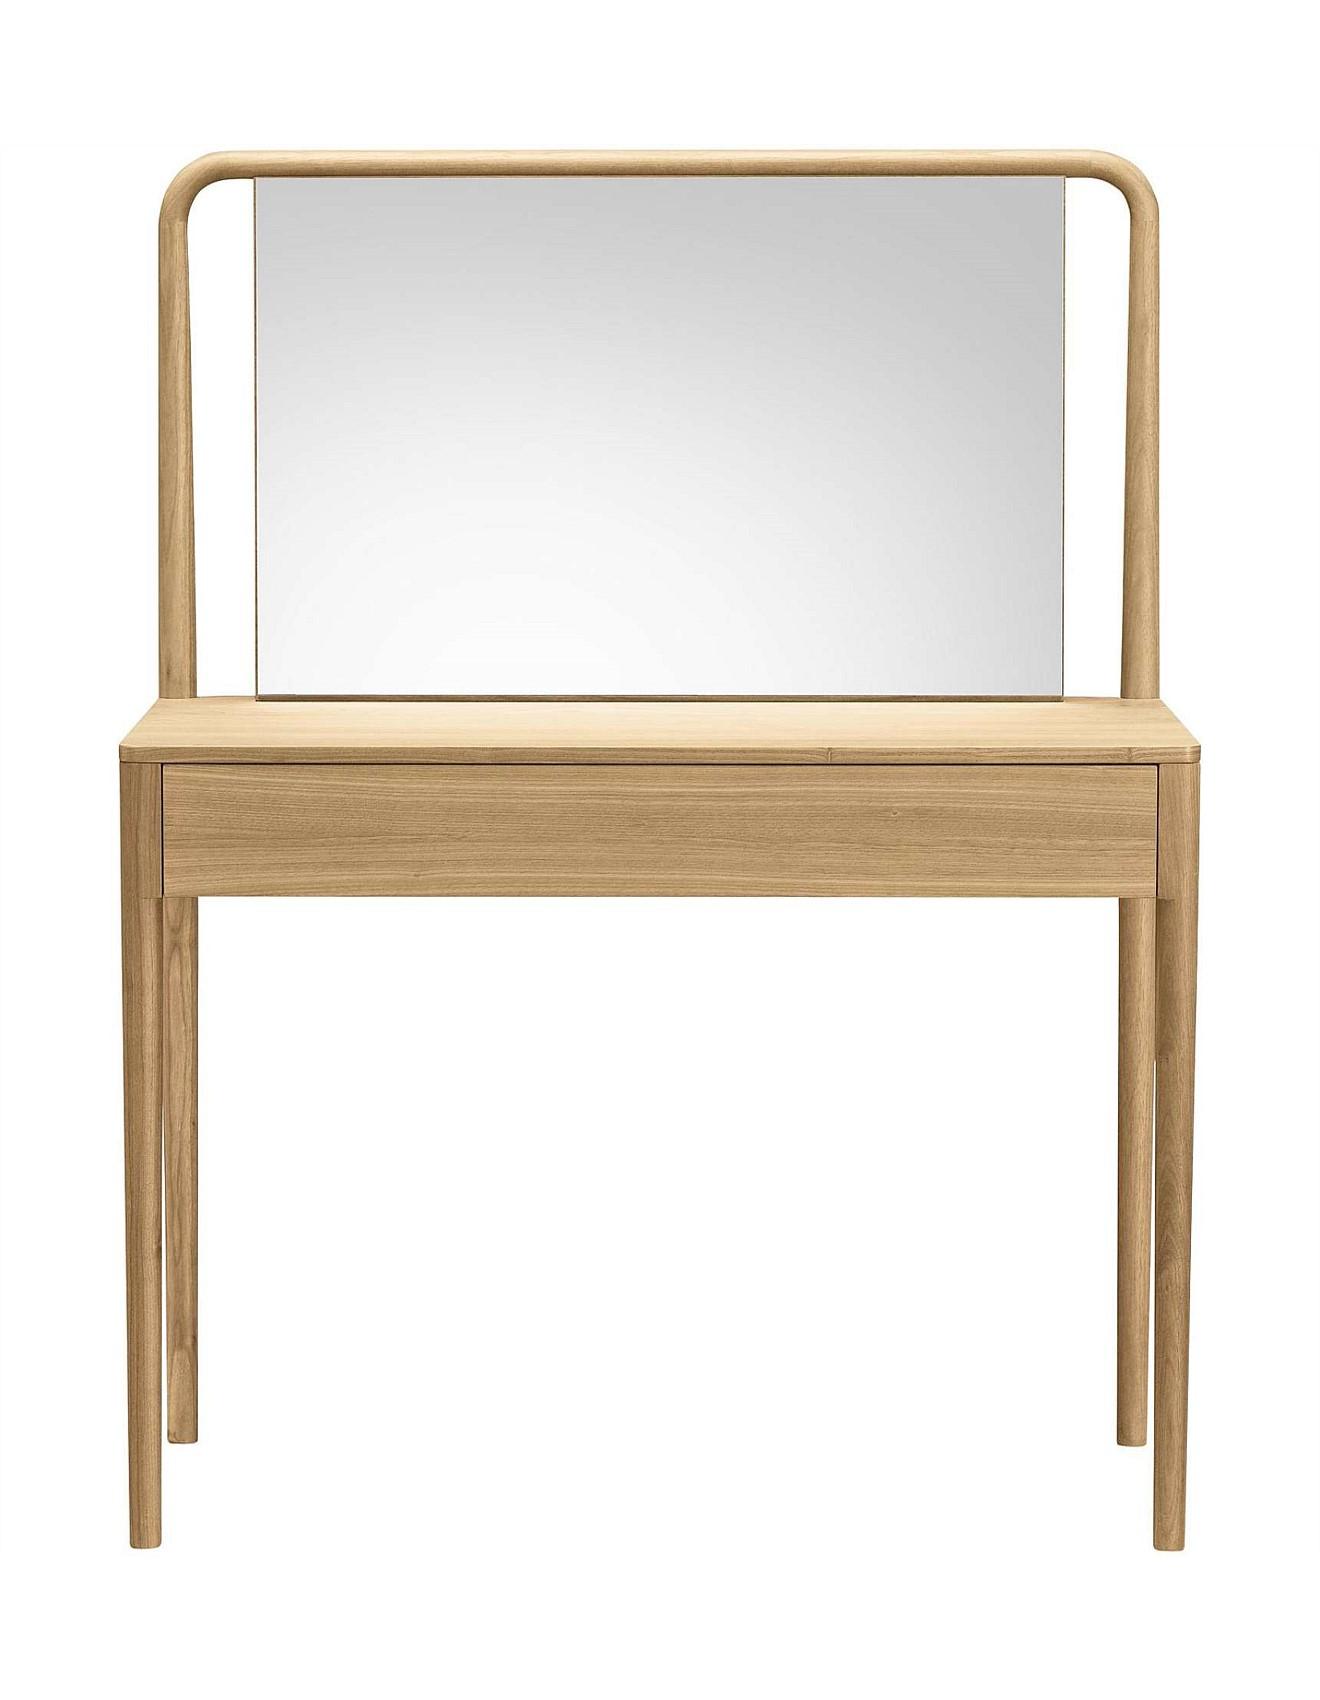 Furniture | Tables, Sofas, Armchairs & More | David Jones - \'Frame ...